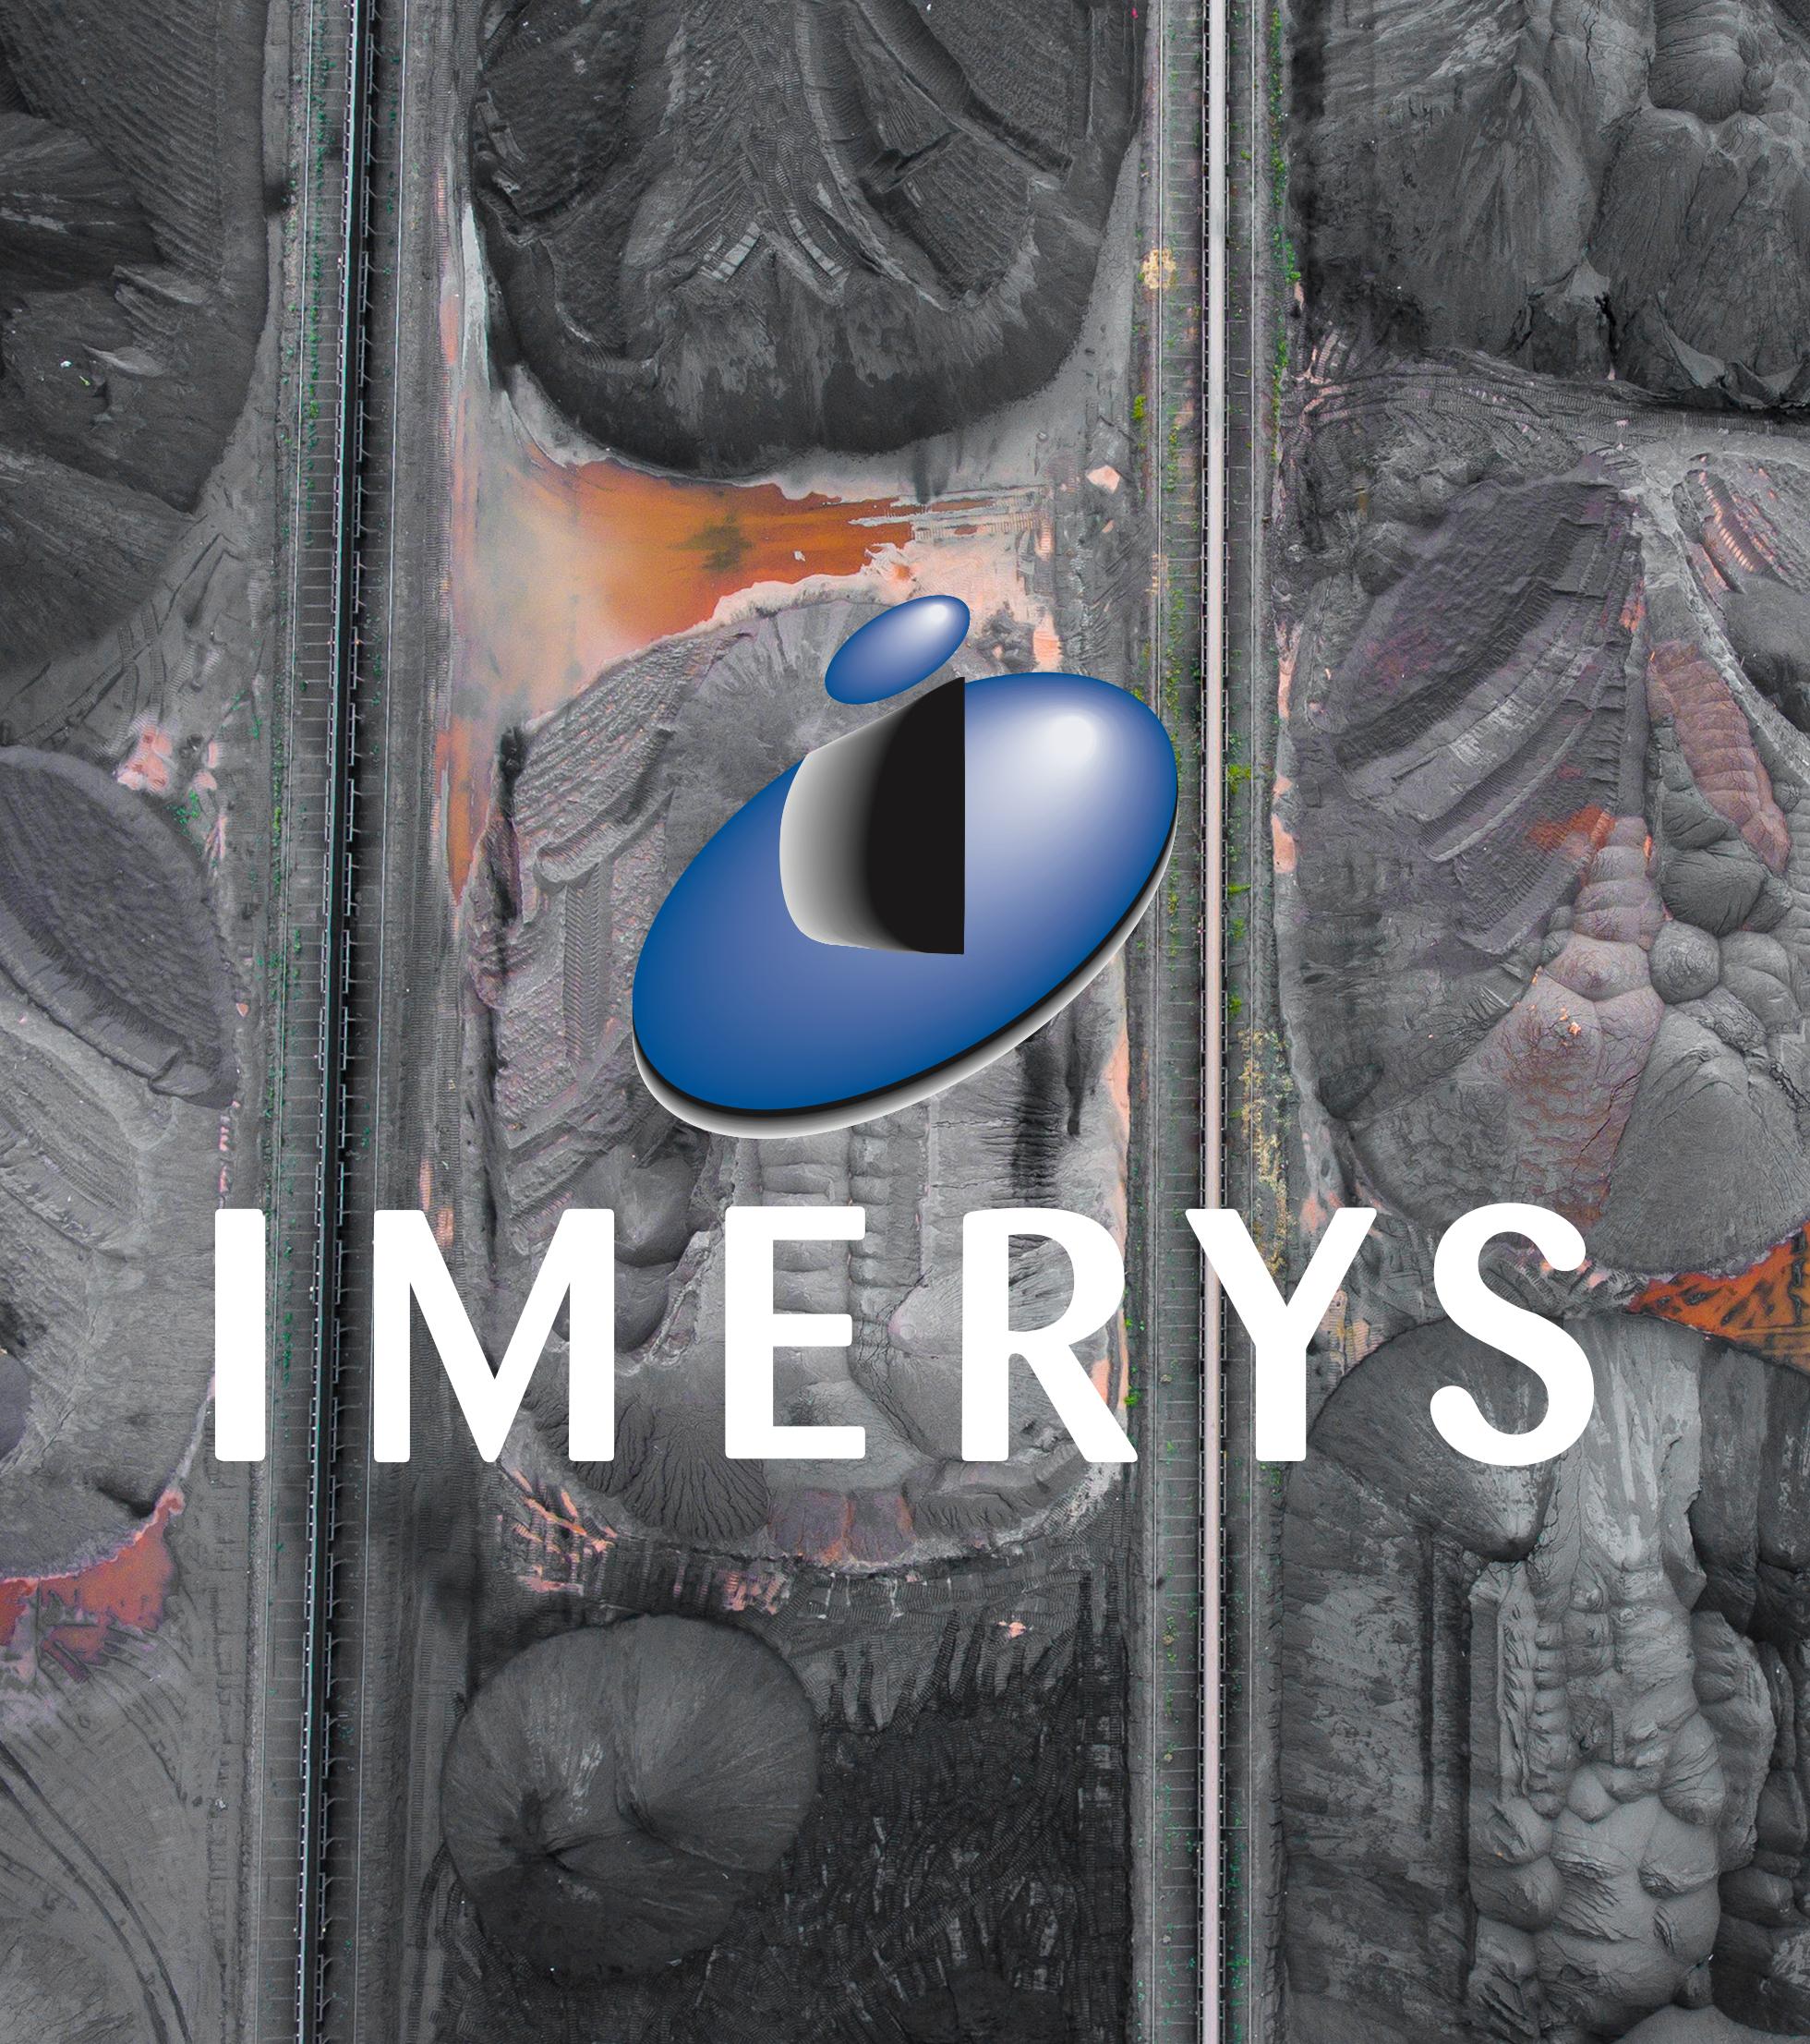 Imerys: Case Study